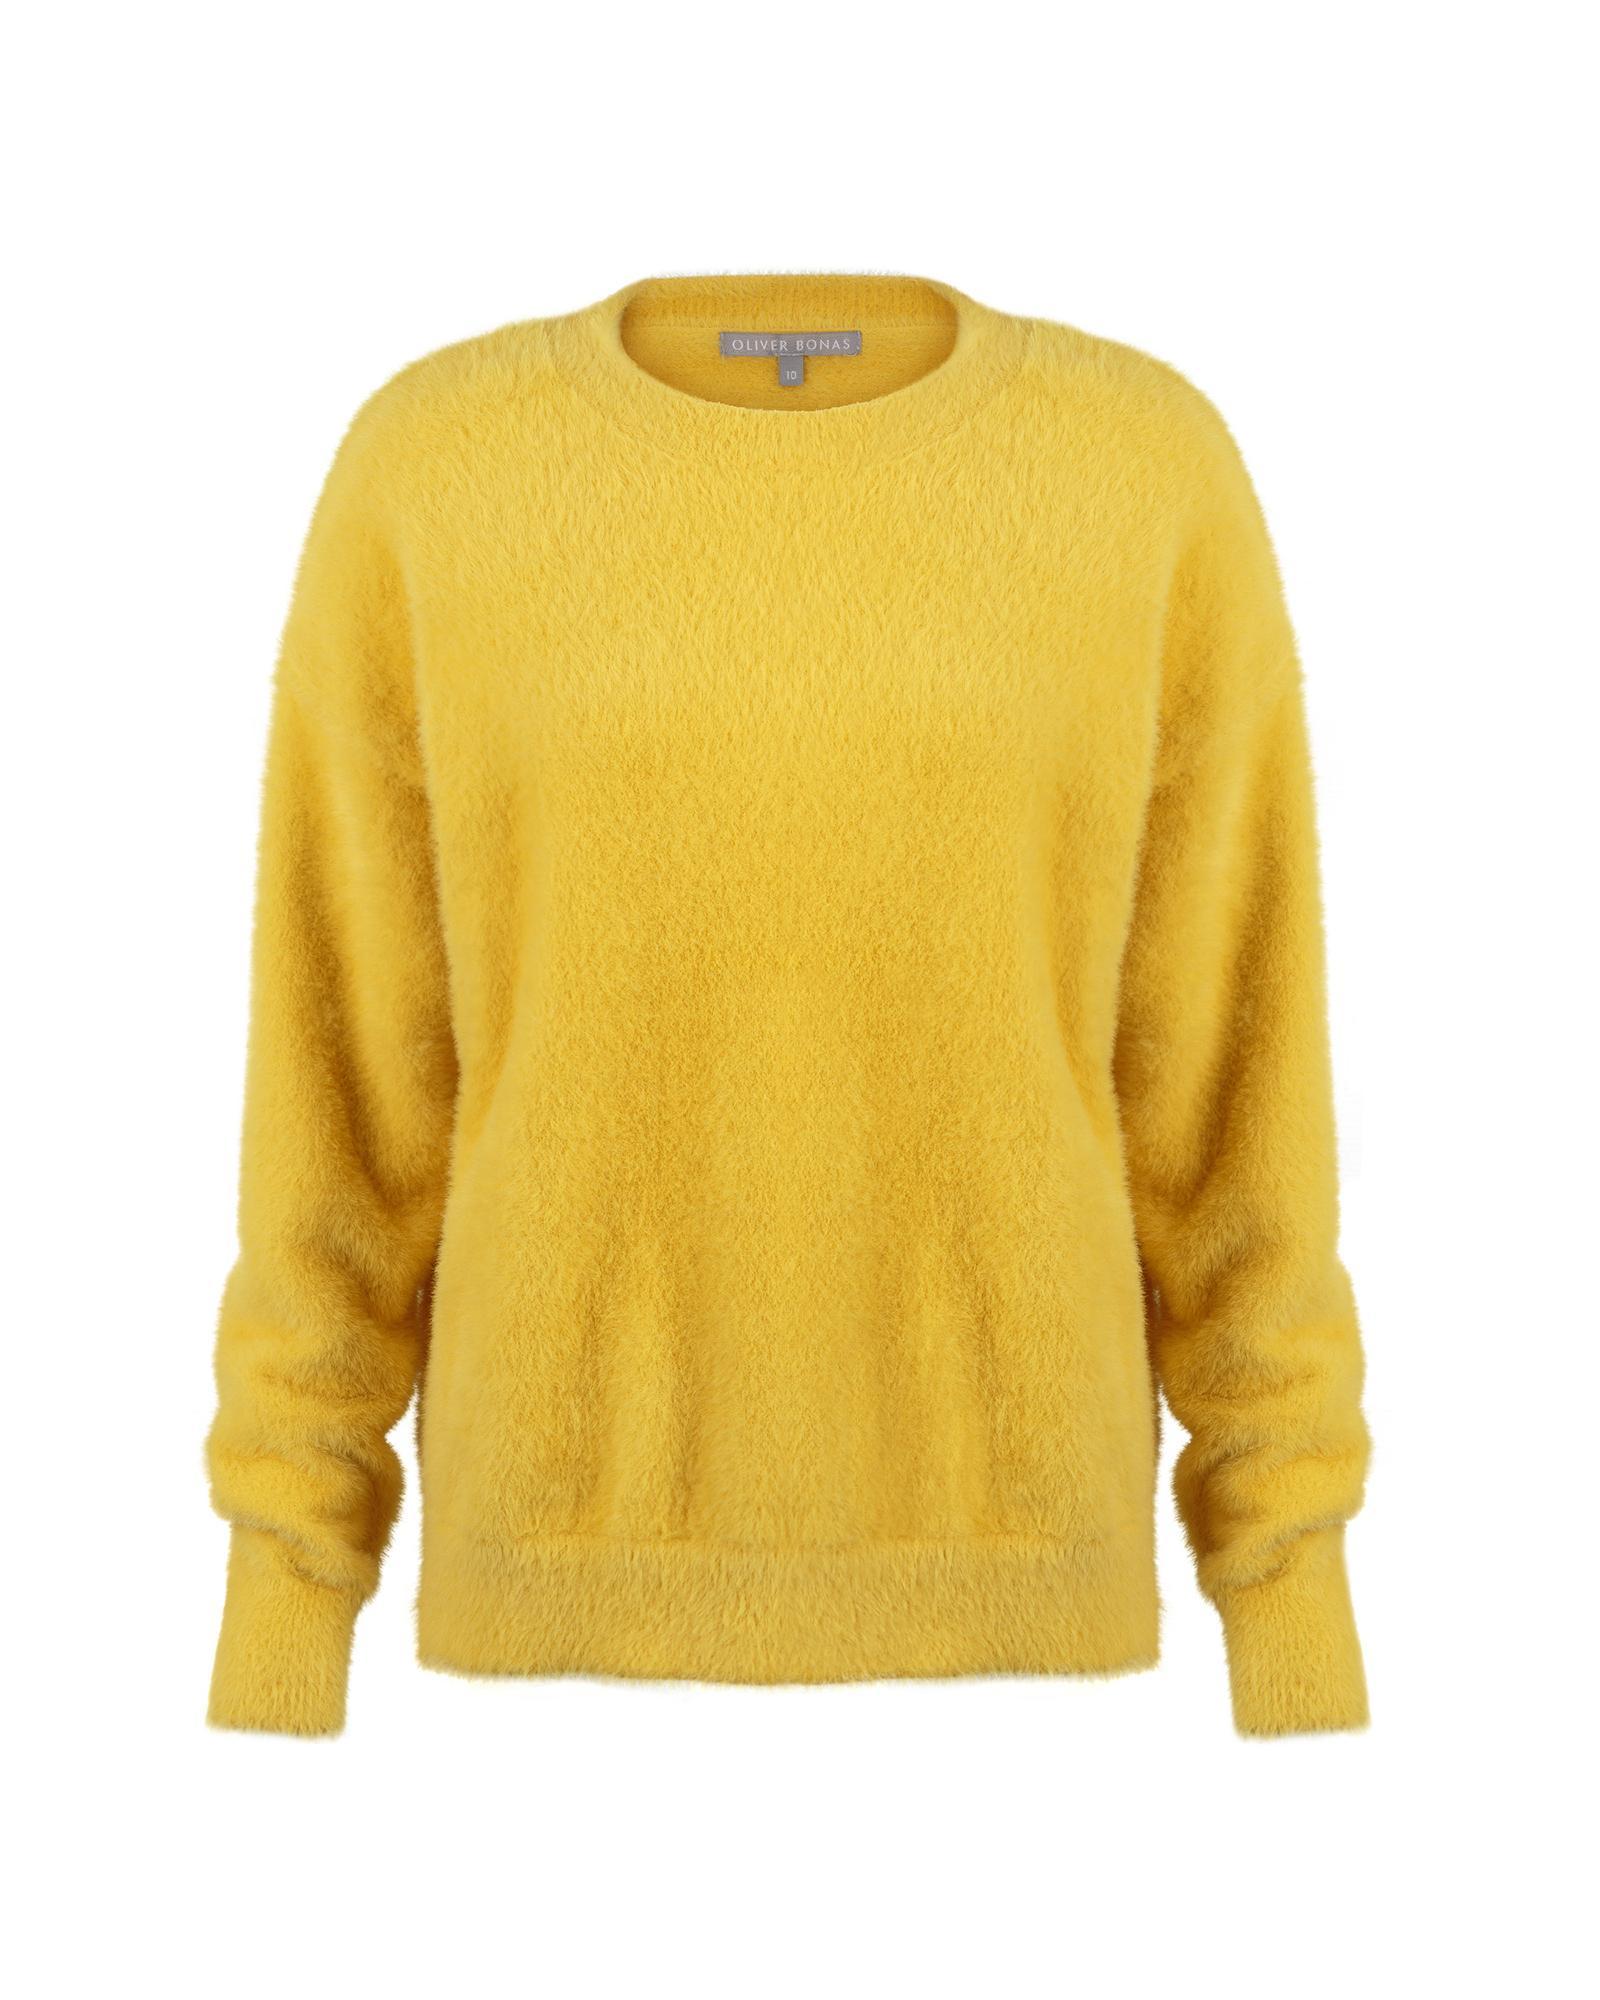 a9a491062e Oliver Bonas - Gloss Fluffy Yellow Sweater - Lyst. View fullscreen